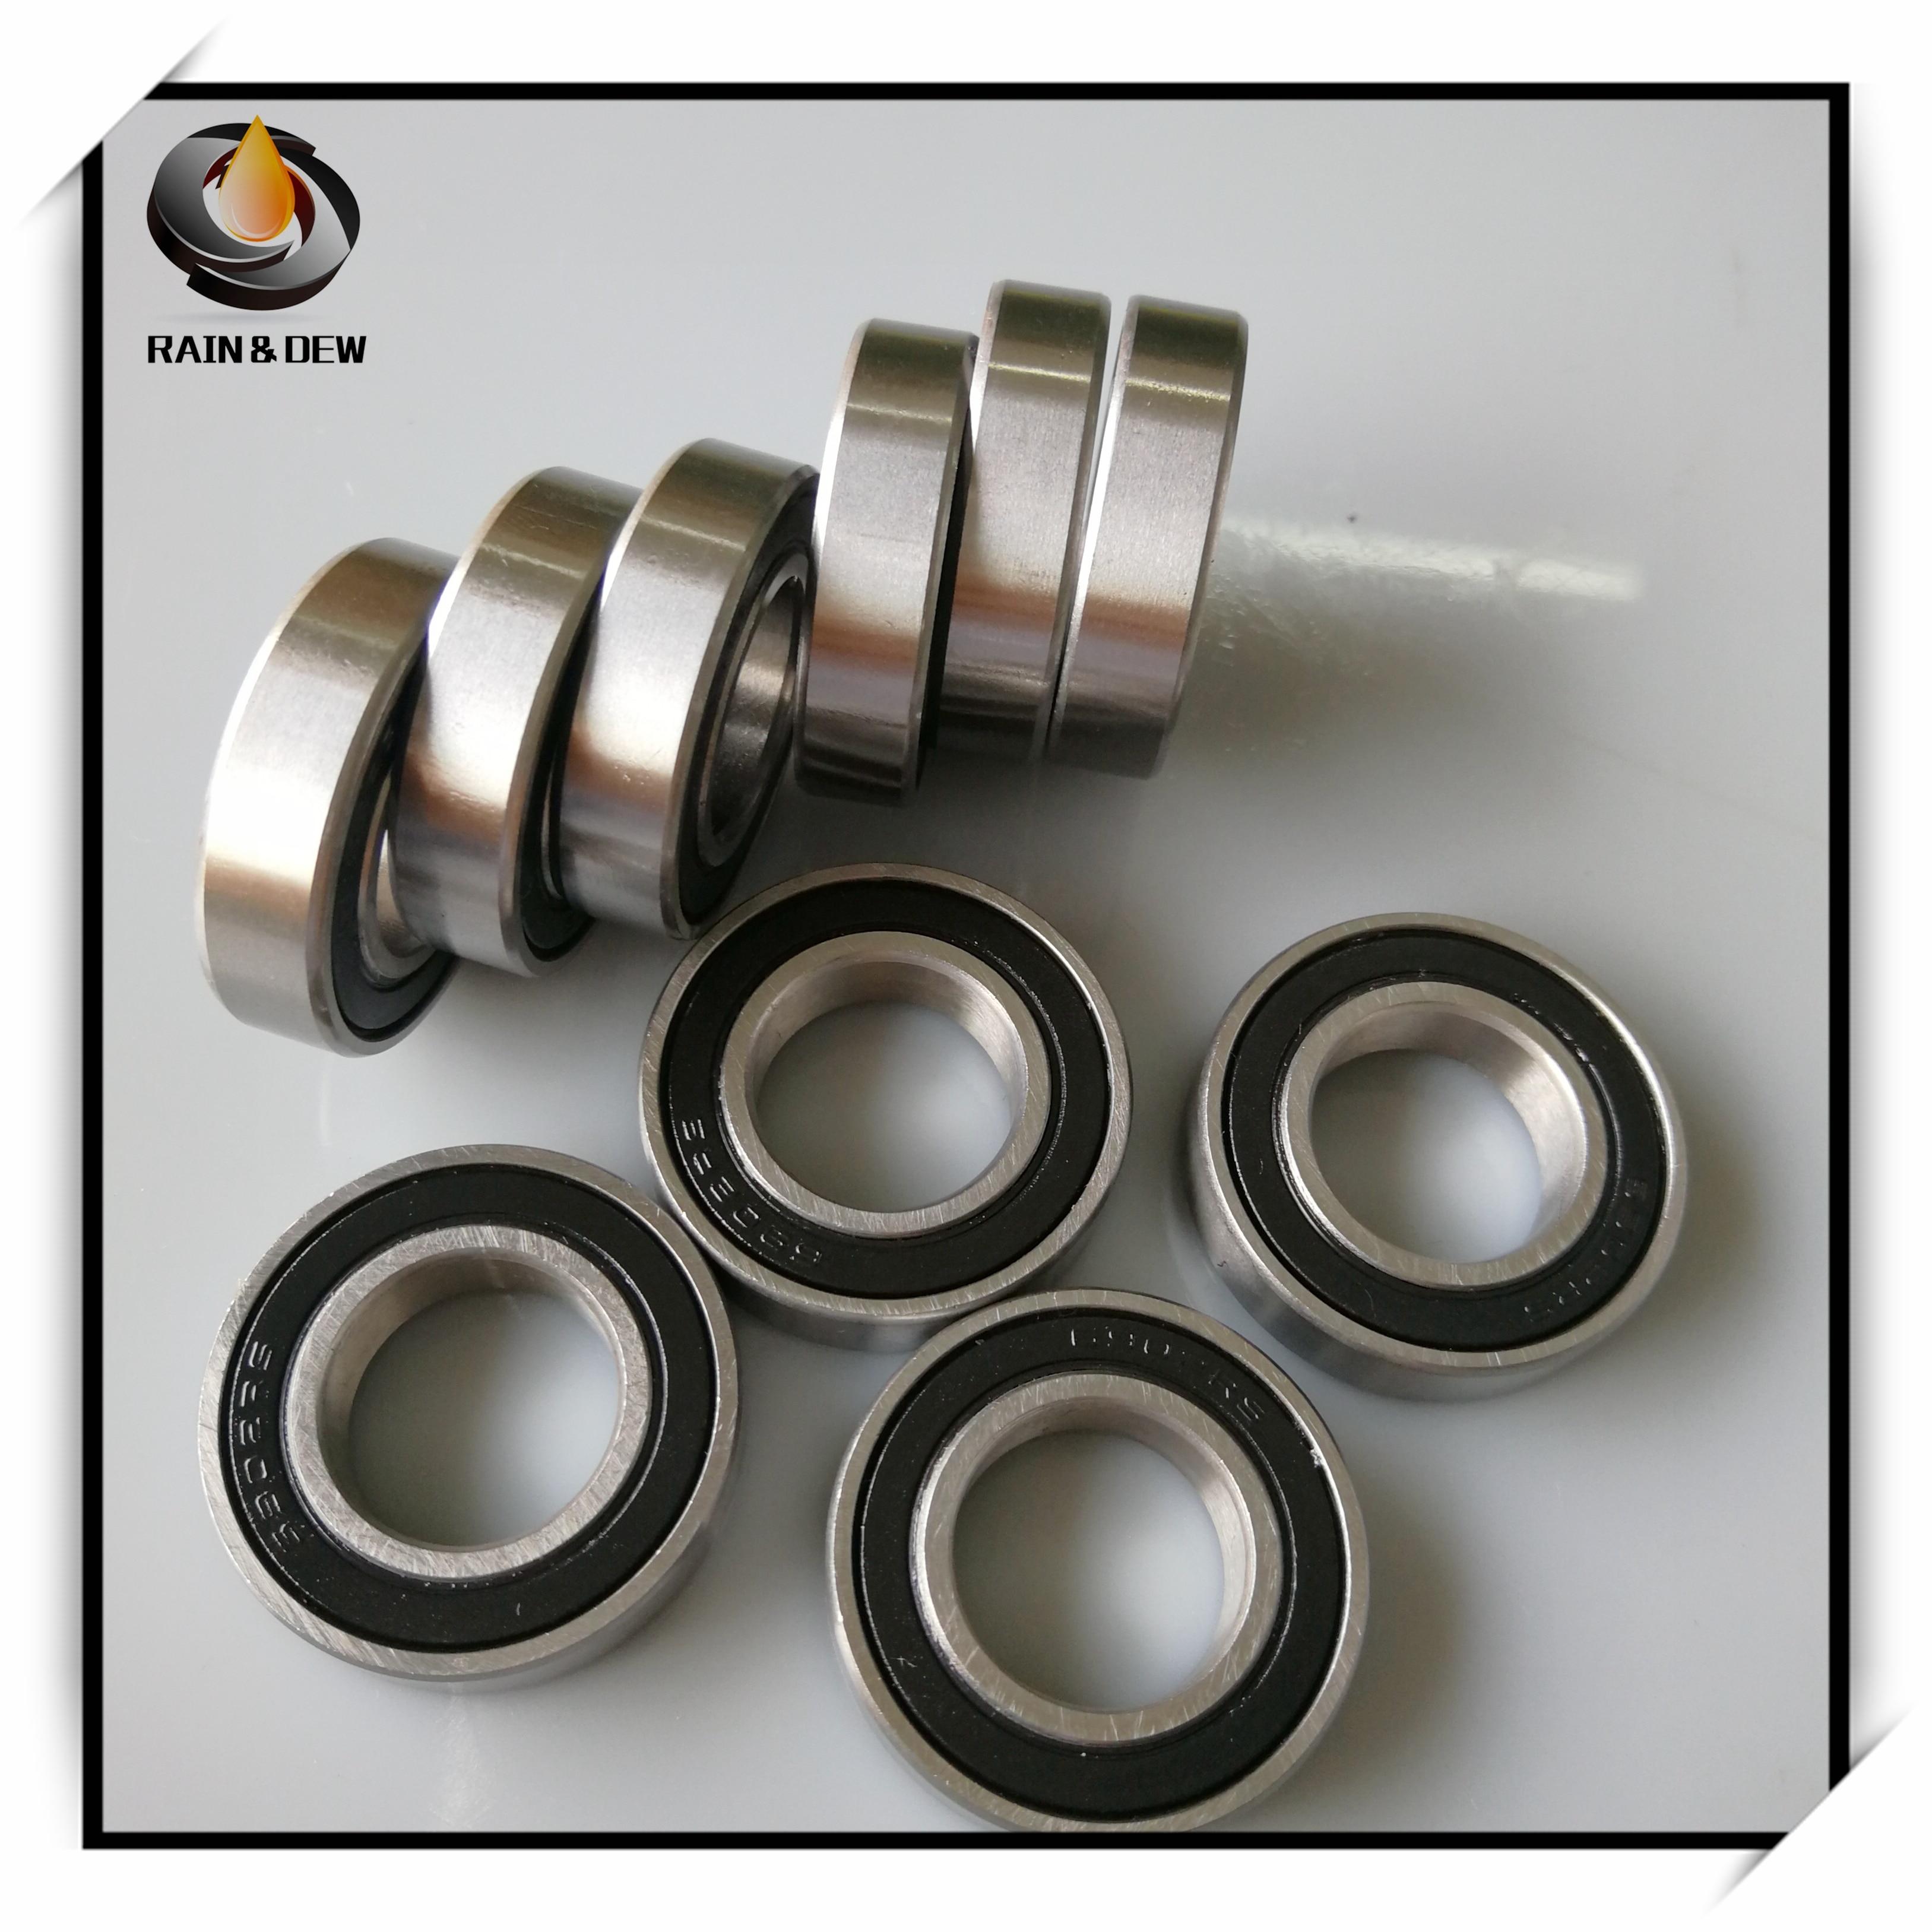 1Pcs 6902 Hybrid Ceramic Bearing 15x28x7 Mm ABEC-7 Bicycle Bottom Brackets & Spares 6902RS Si3N4 Ball Bearings